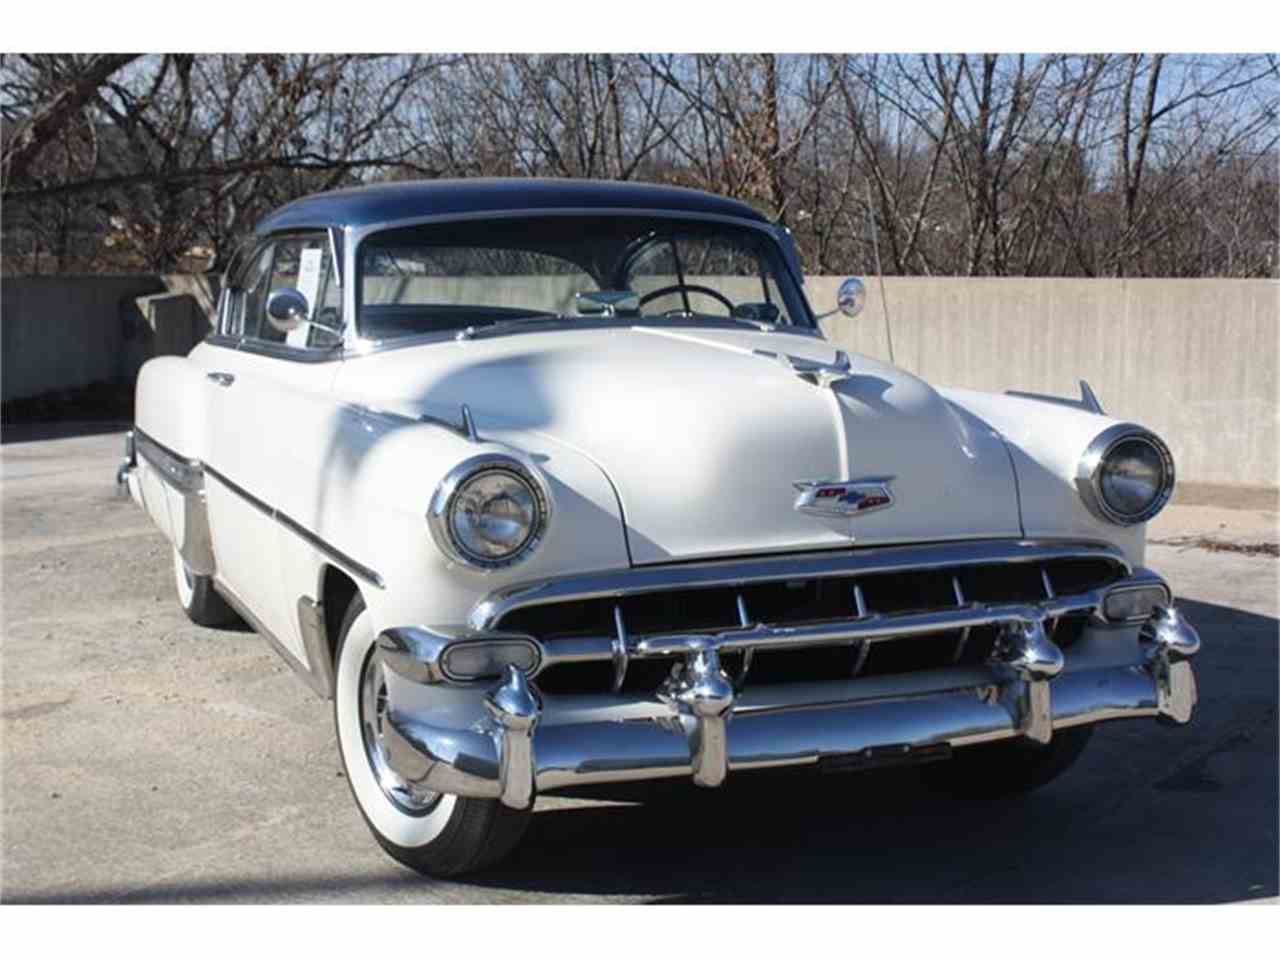 1954 Chevrolet Bel Air Sport Coupe C2454 1037d 12195354 1953 1957 Wiring Diagram For Sale Classiccarscom Cc774936